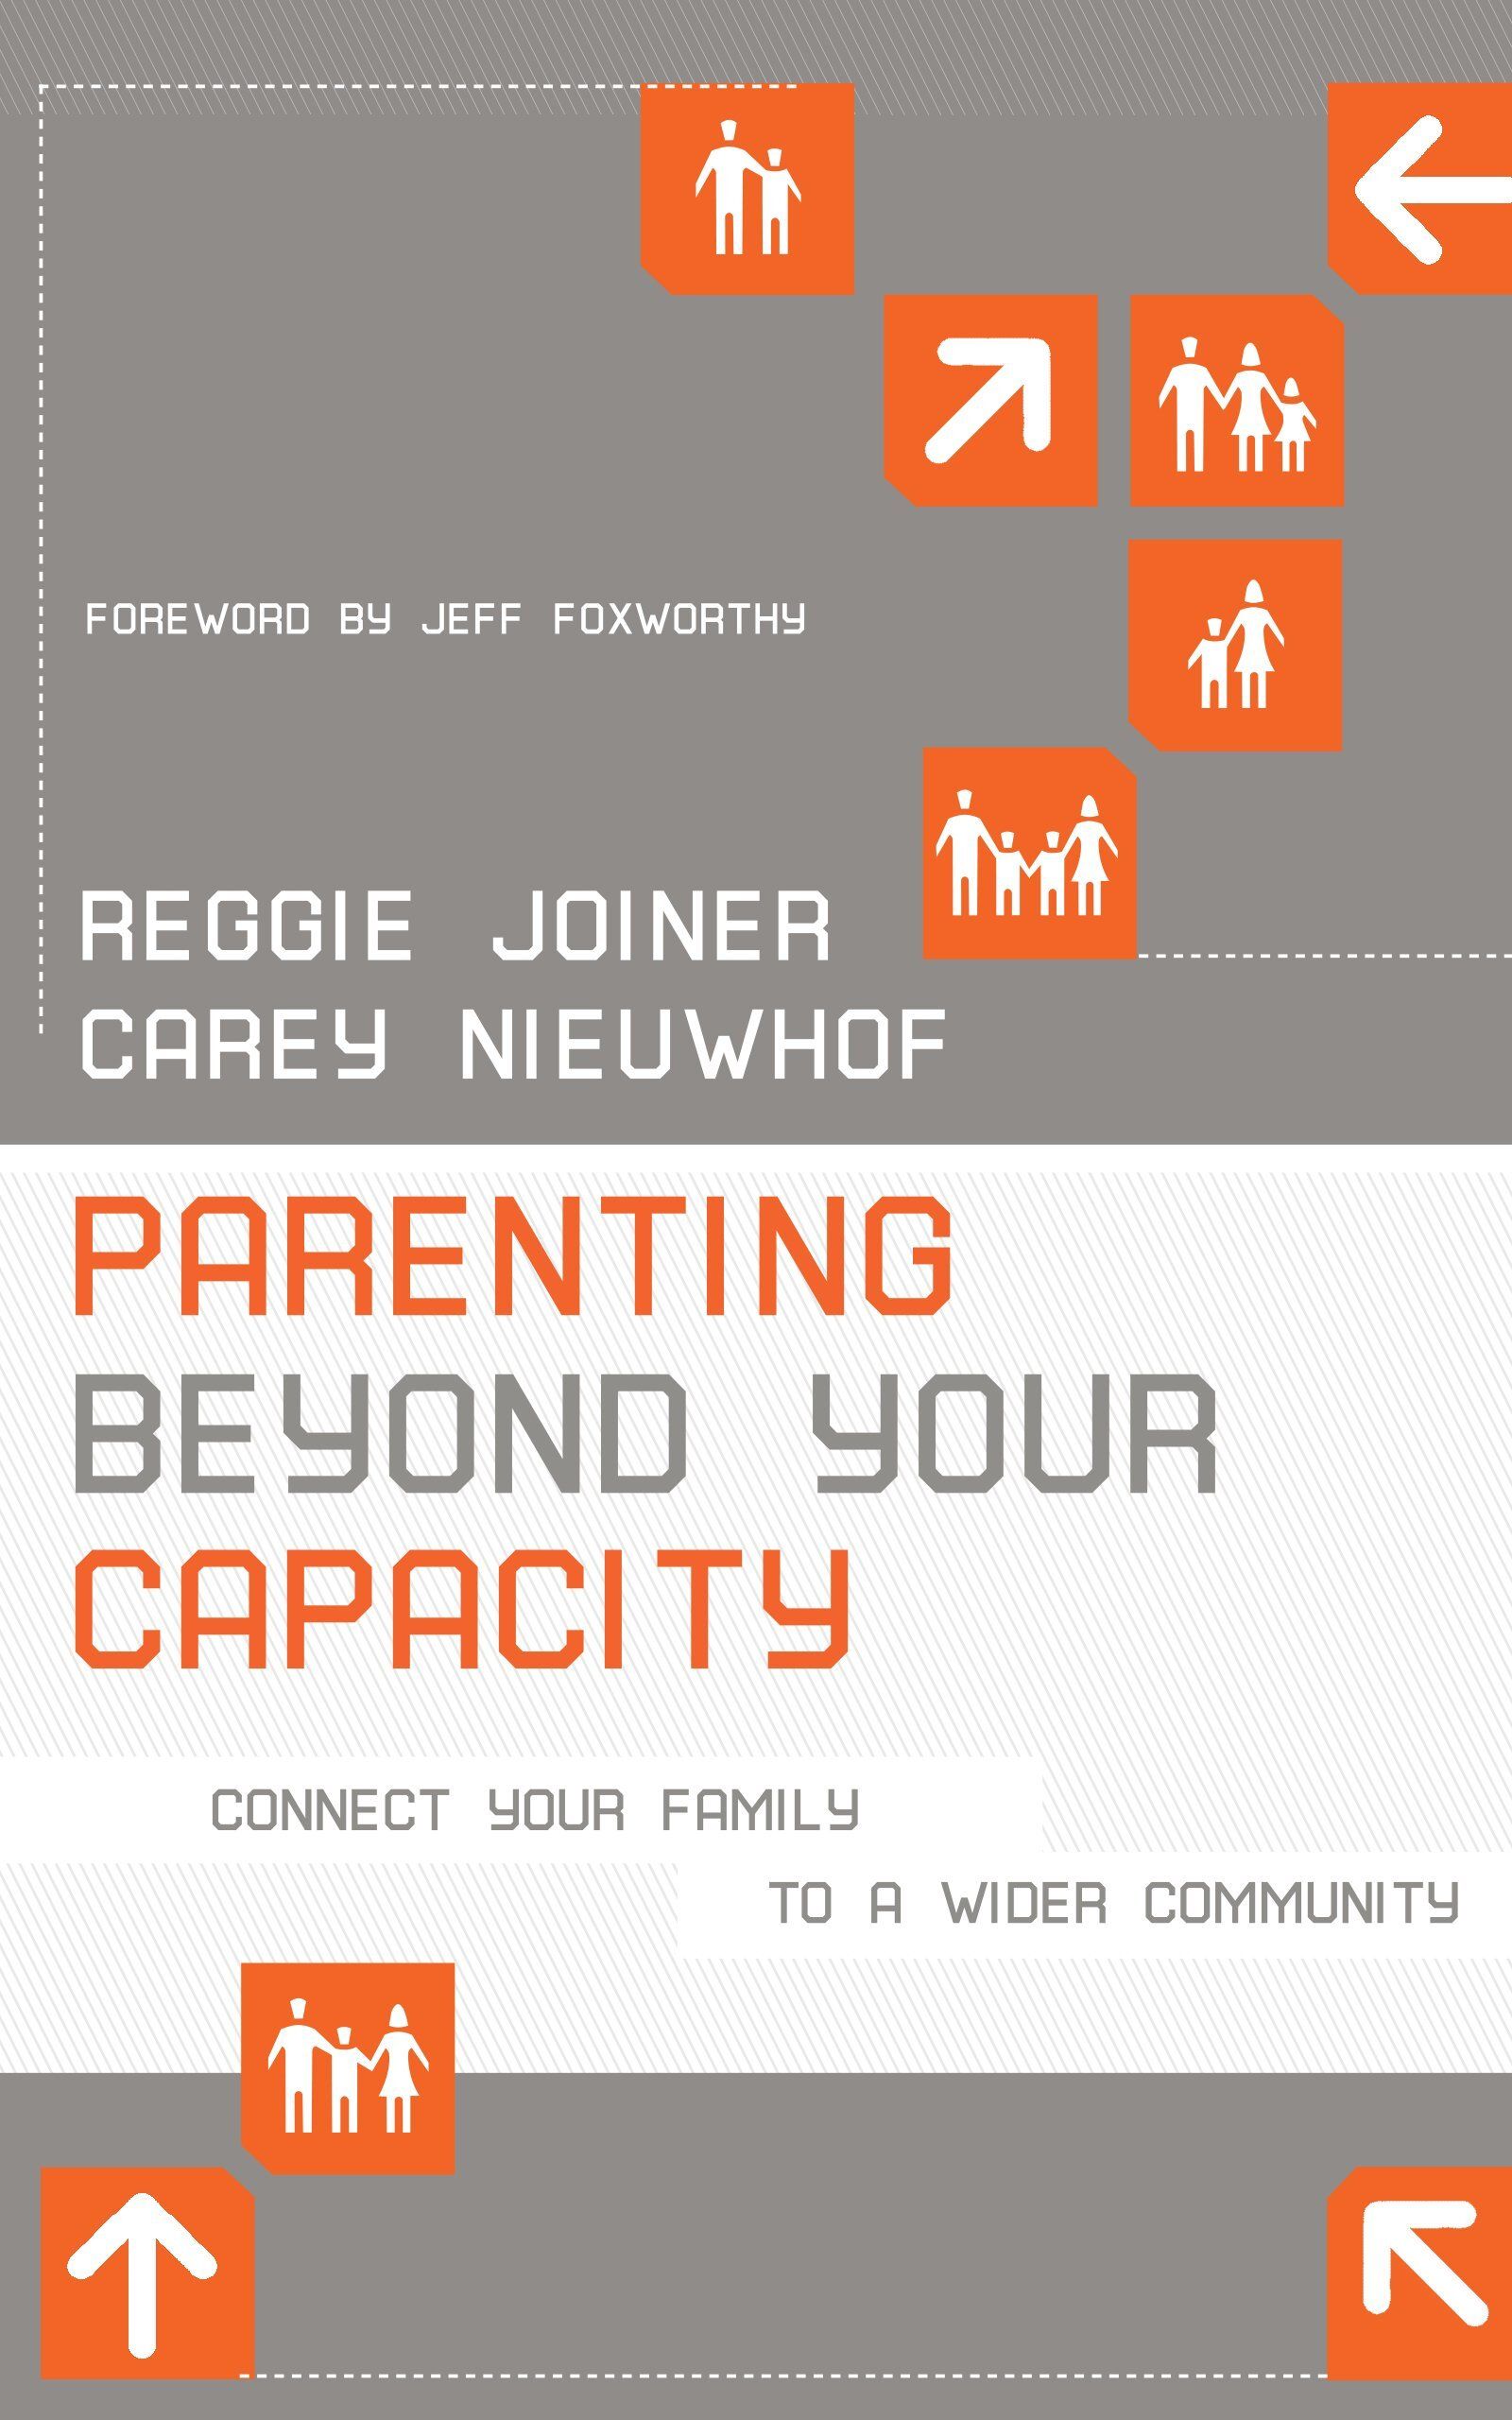 Parenting Beyond Your Capacity Reggie Joiner & carey Nieuwhof  Orange   amazon